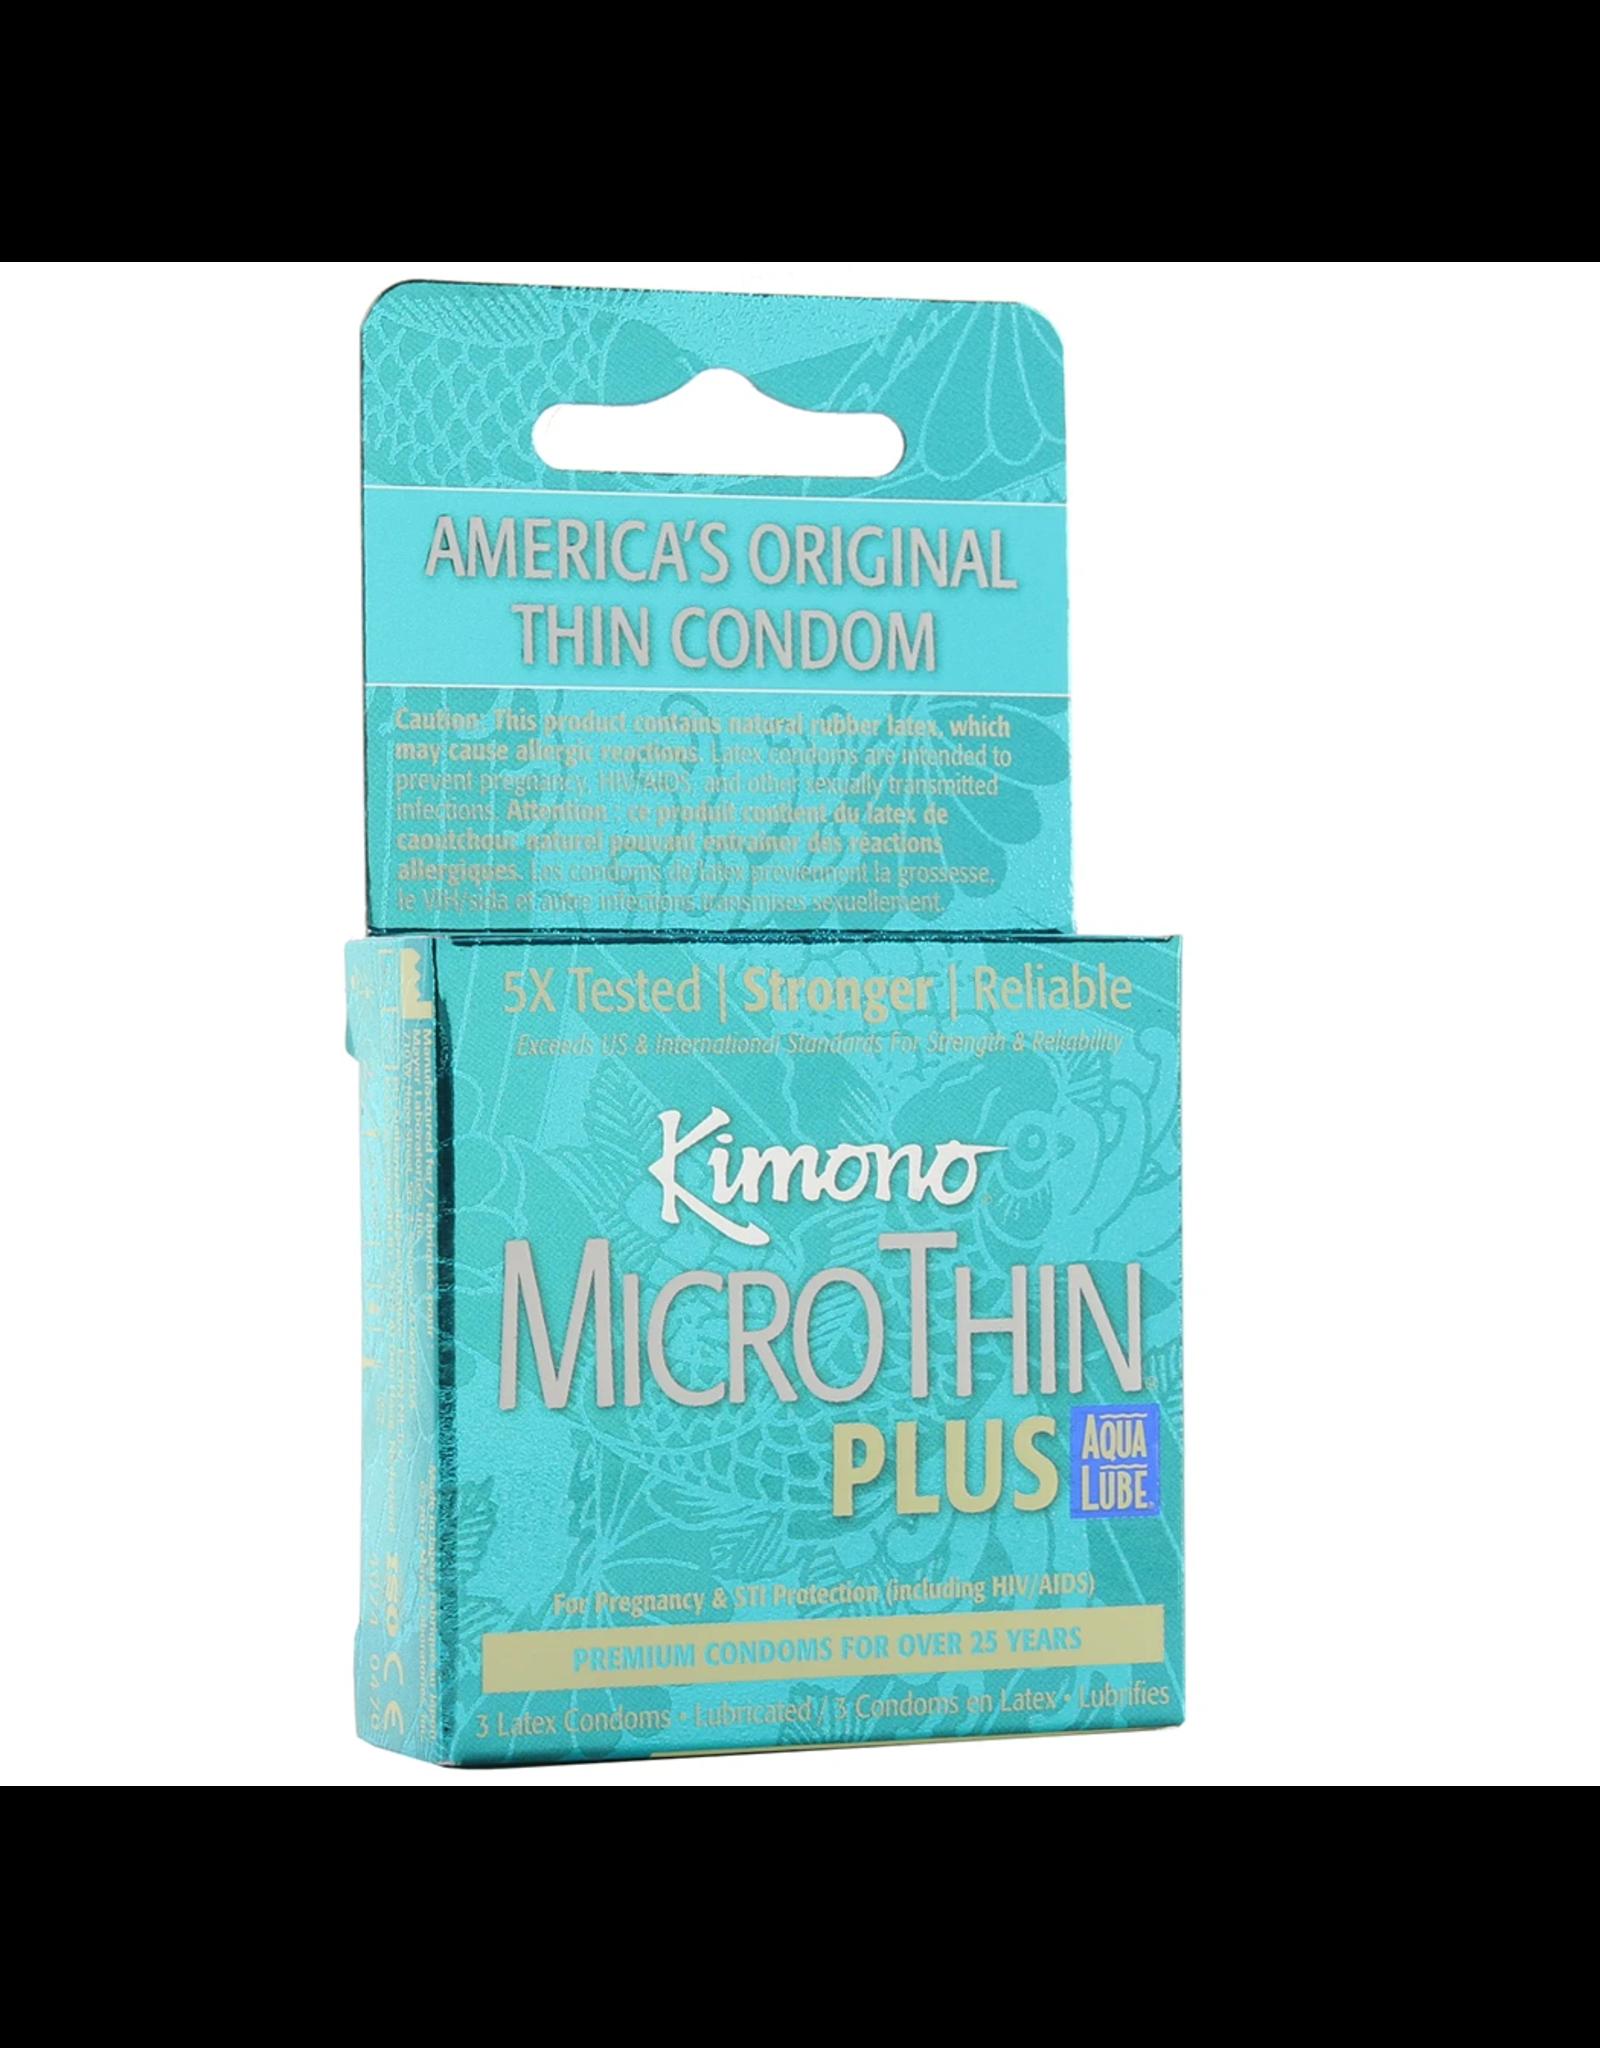 KIMONO KIMONO - MICRO THIN PLUS (AQUA BOX)  x3